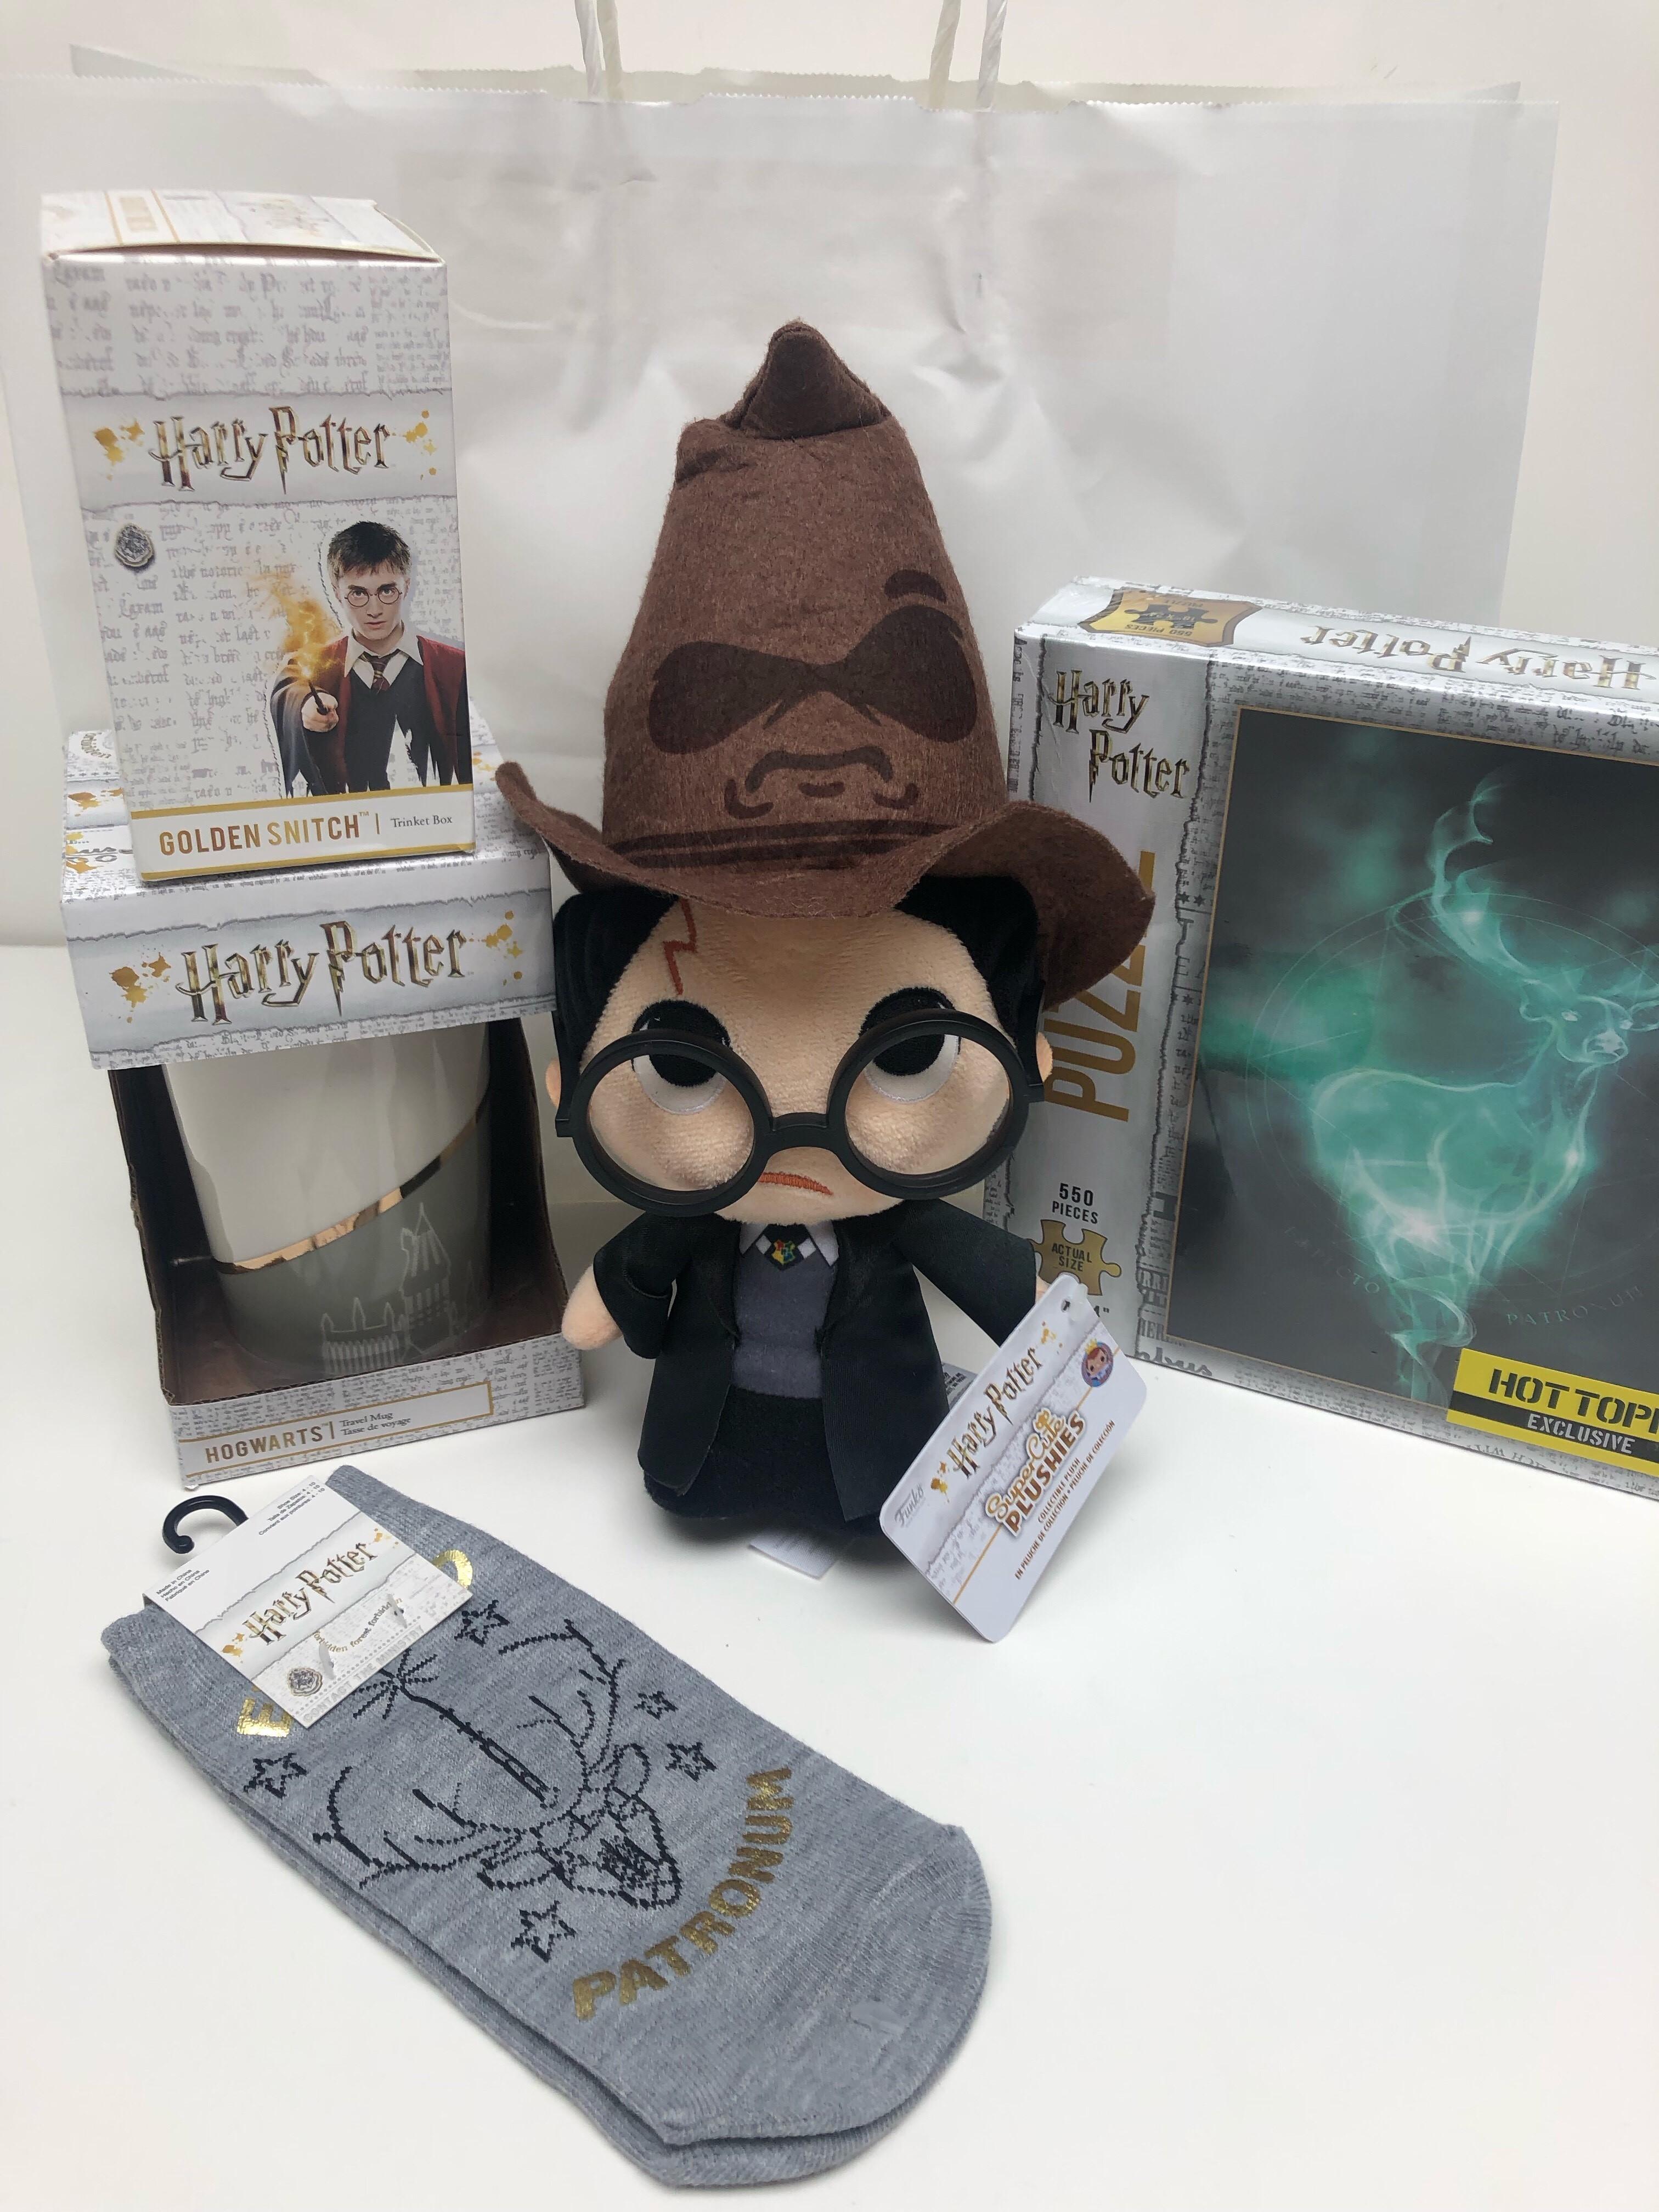 #DiscoverHogwarts prize pack